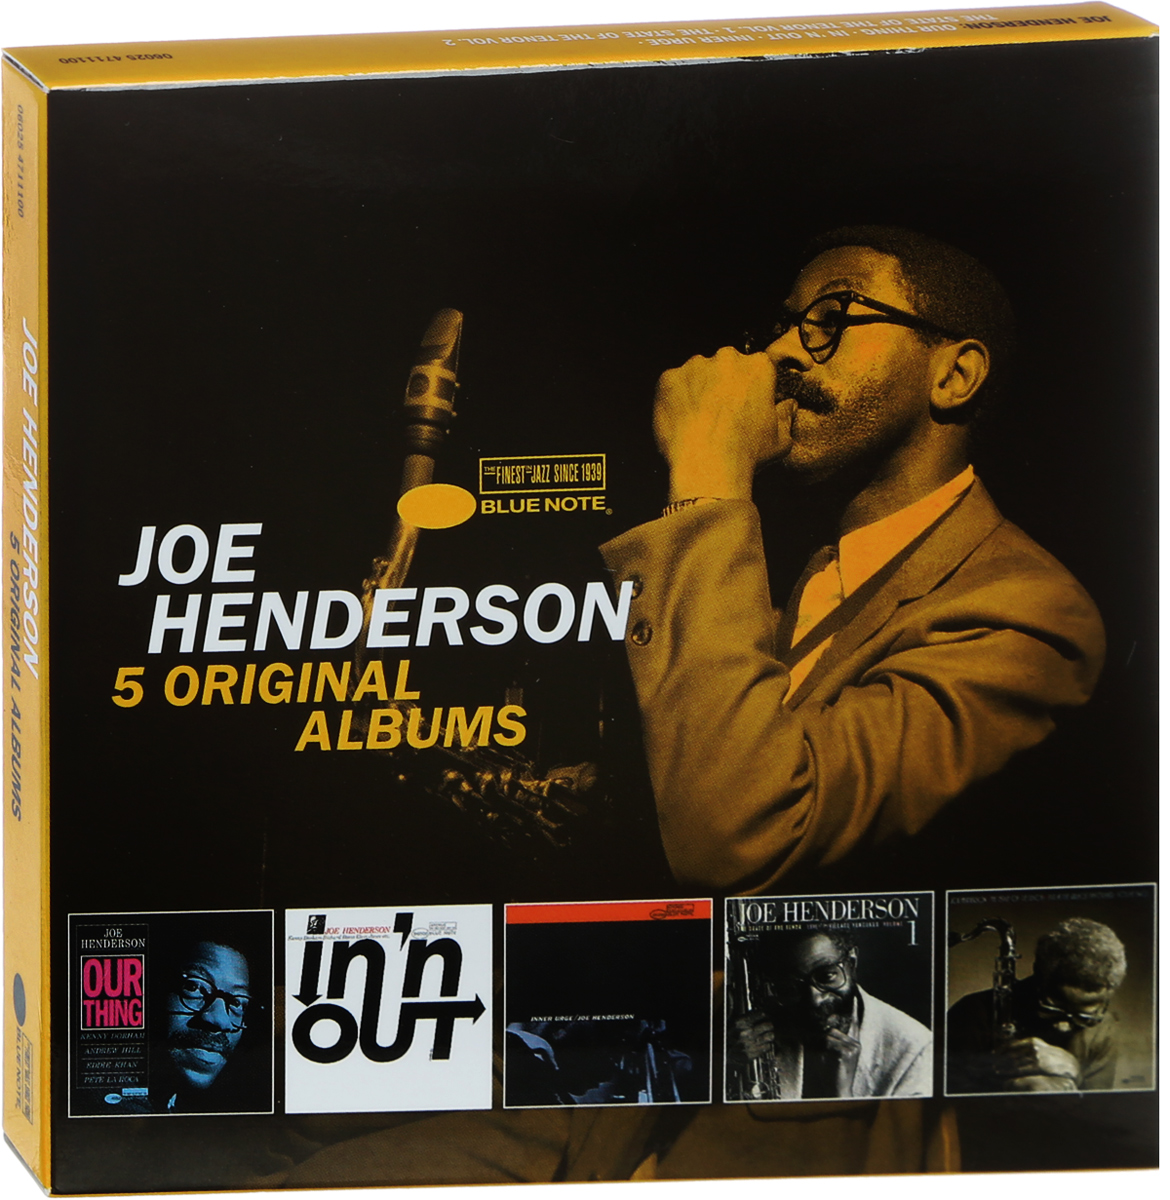 Джо Хендерсон Joe Henderson. 5 Original Albums (5 CD) джо сатриани joe satriani original album classics 5 cd